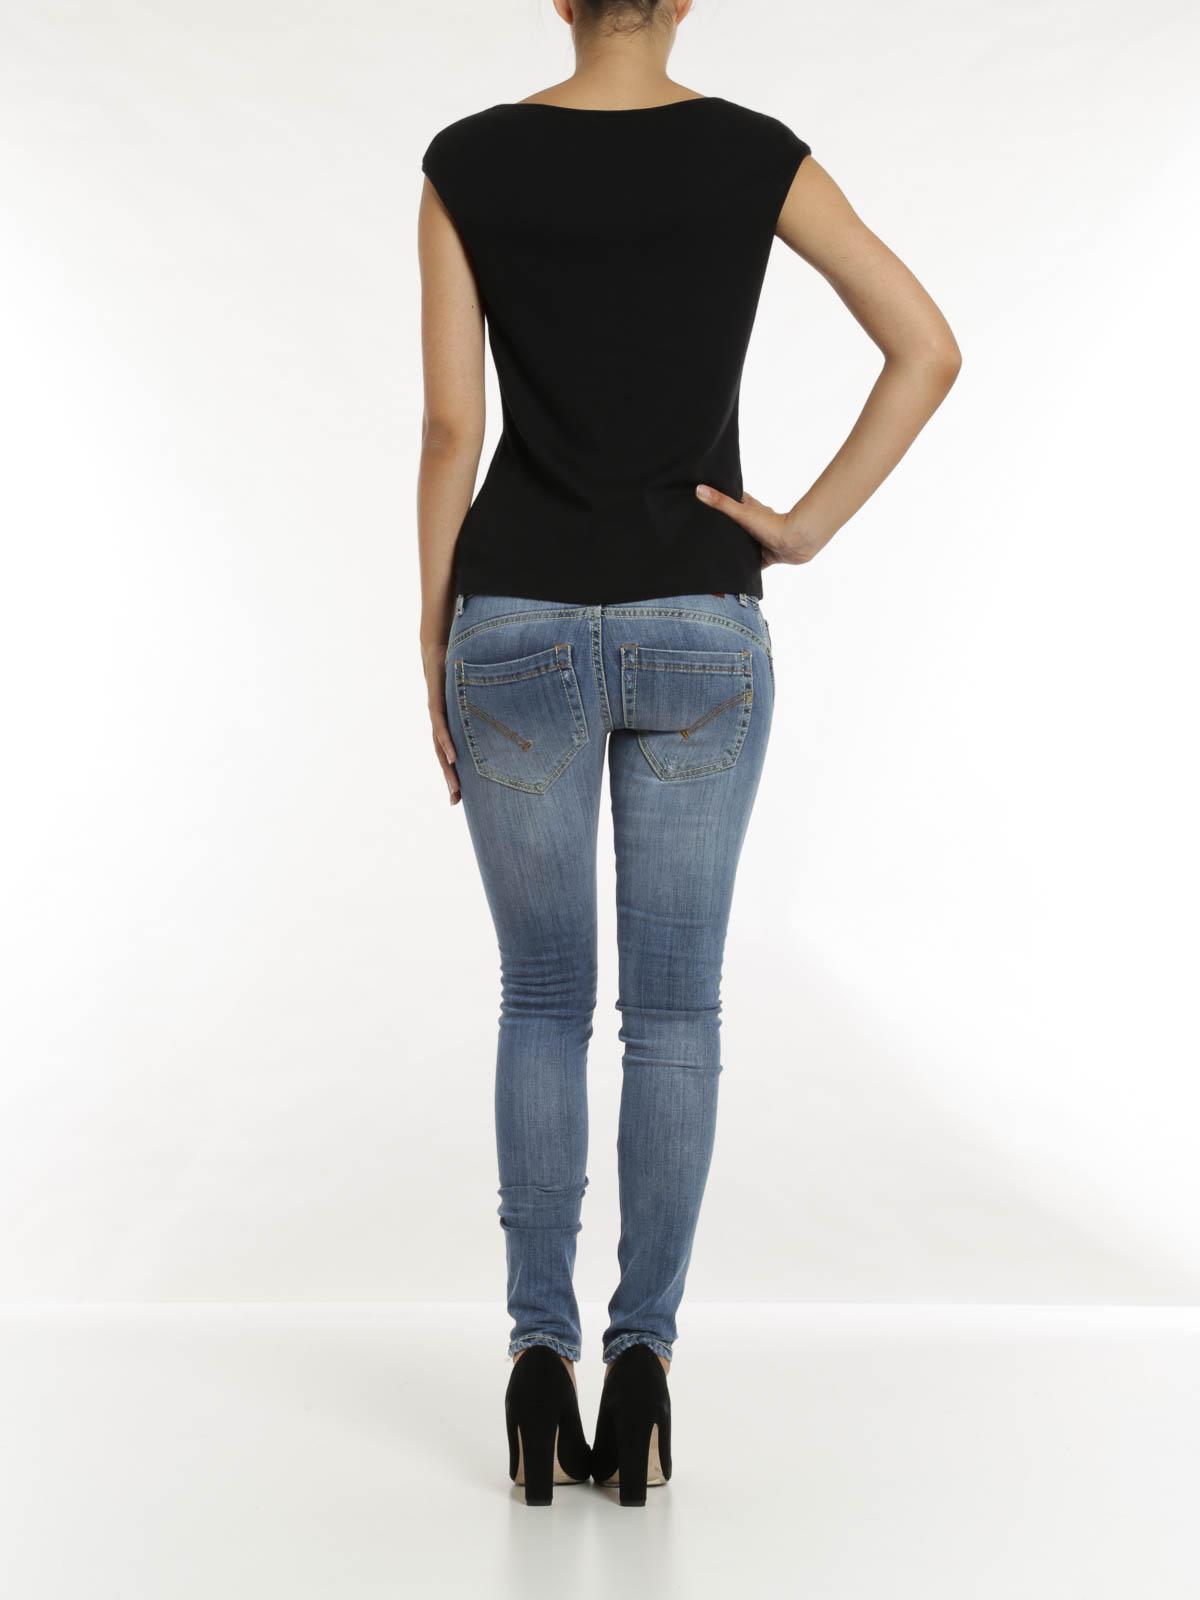 cdf57ec0b69 Herren · Kleidung · Accessoires · Taschen · Schuhe · Jetzt shoppen. Jeans  Lambda shop online  DONDUP